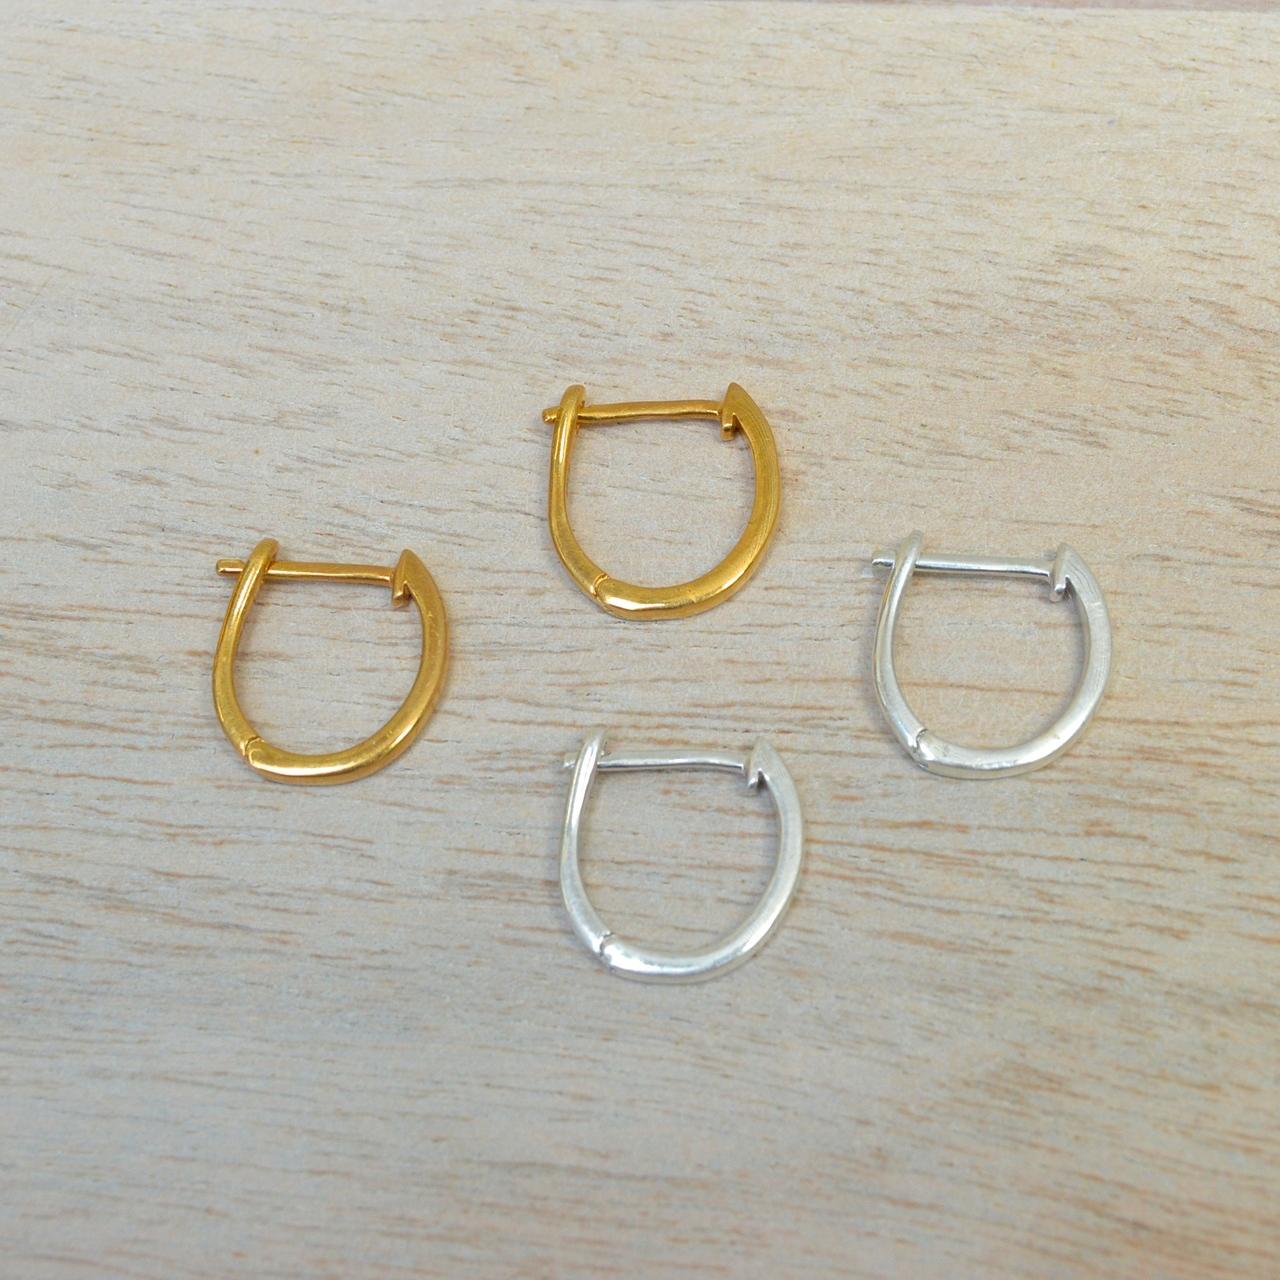 Huggie Earrings in Gold or Silver